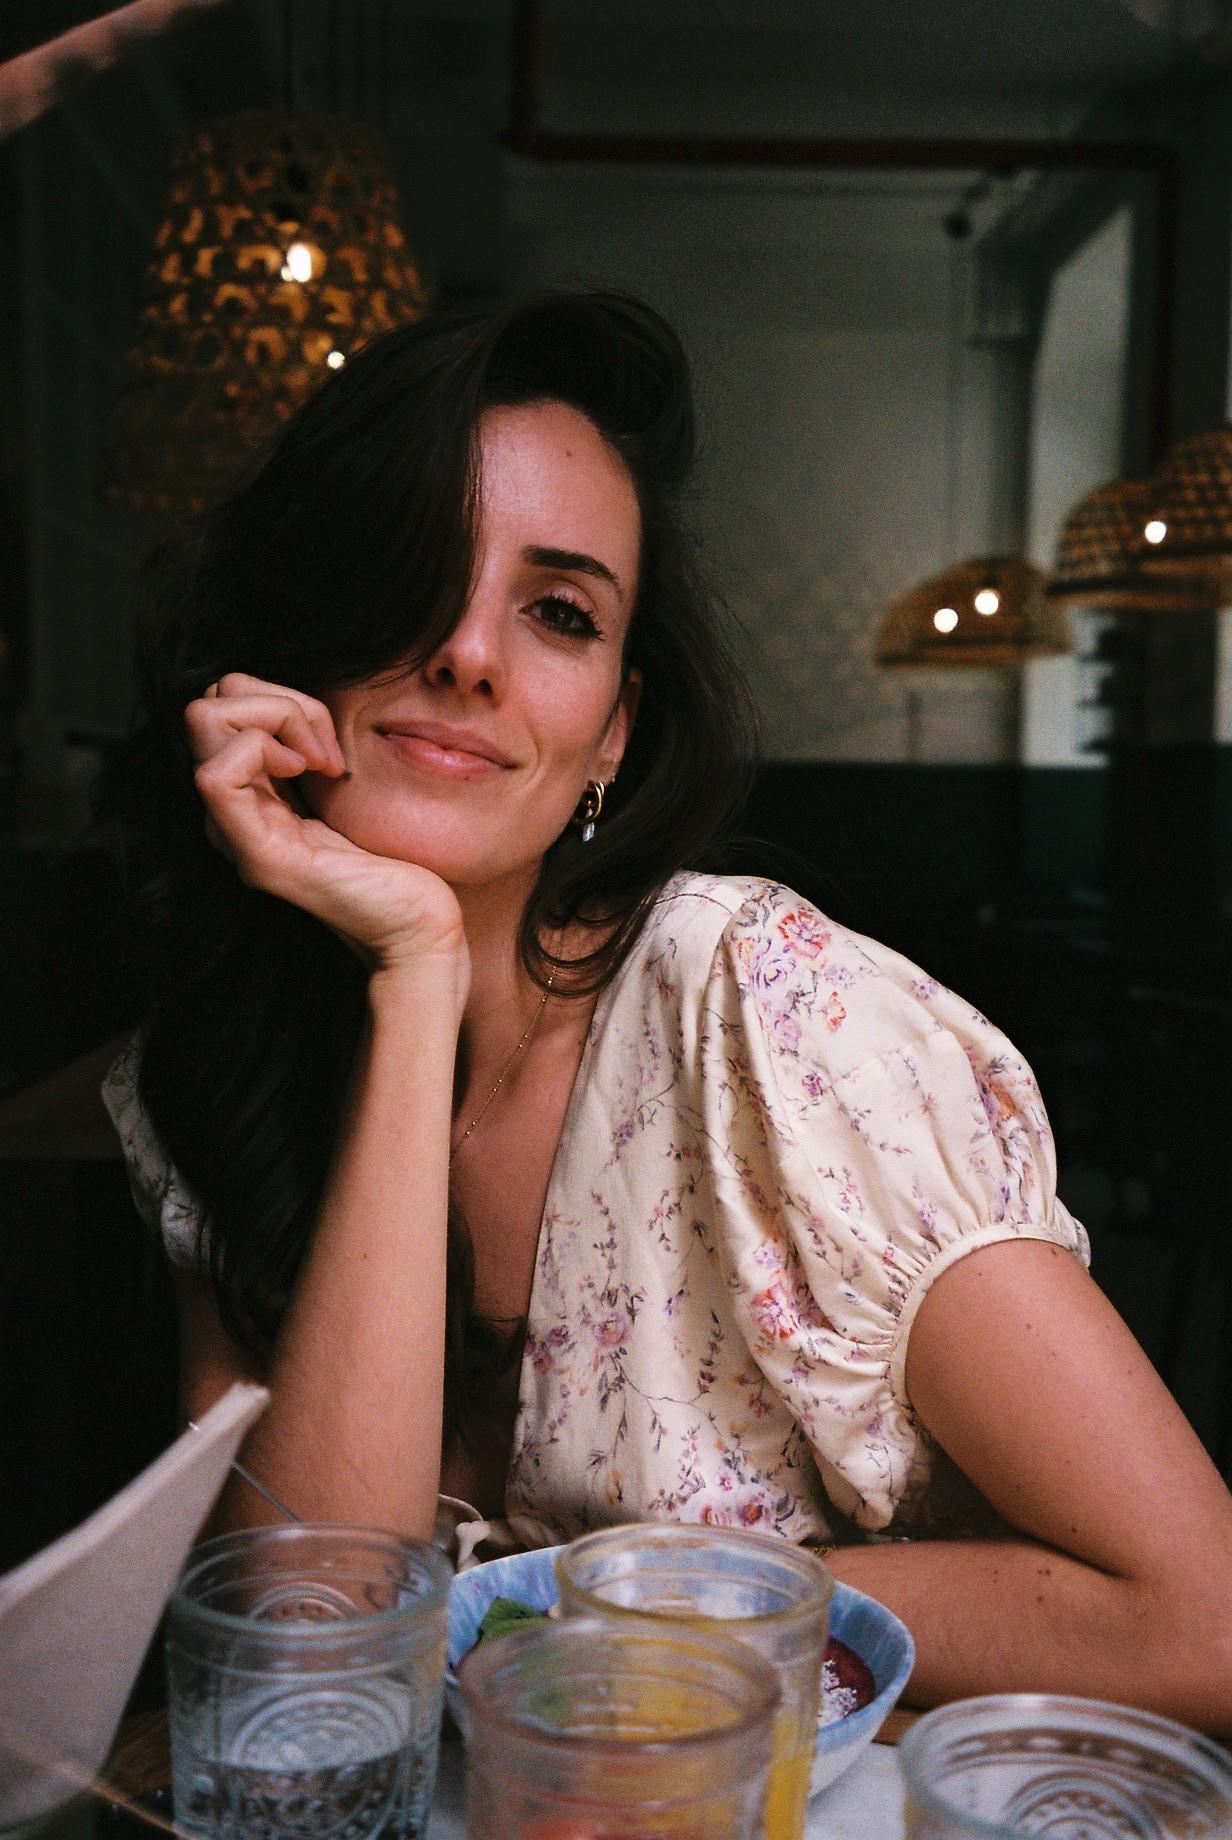 Having lunch with Catarina Pereira at  Cotidiano  in Lisbon. / A almoçar com a Catarina Pereira no  Cotidiano  em Lisboa.